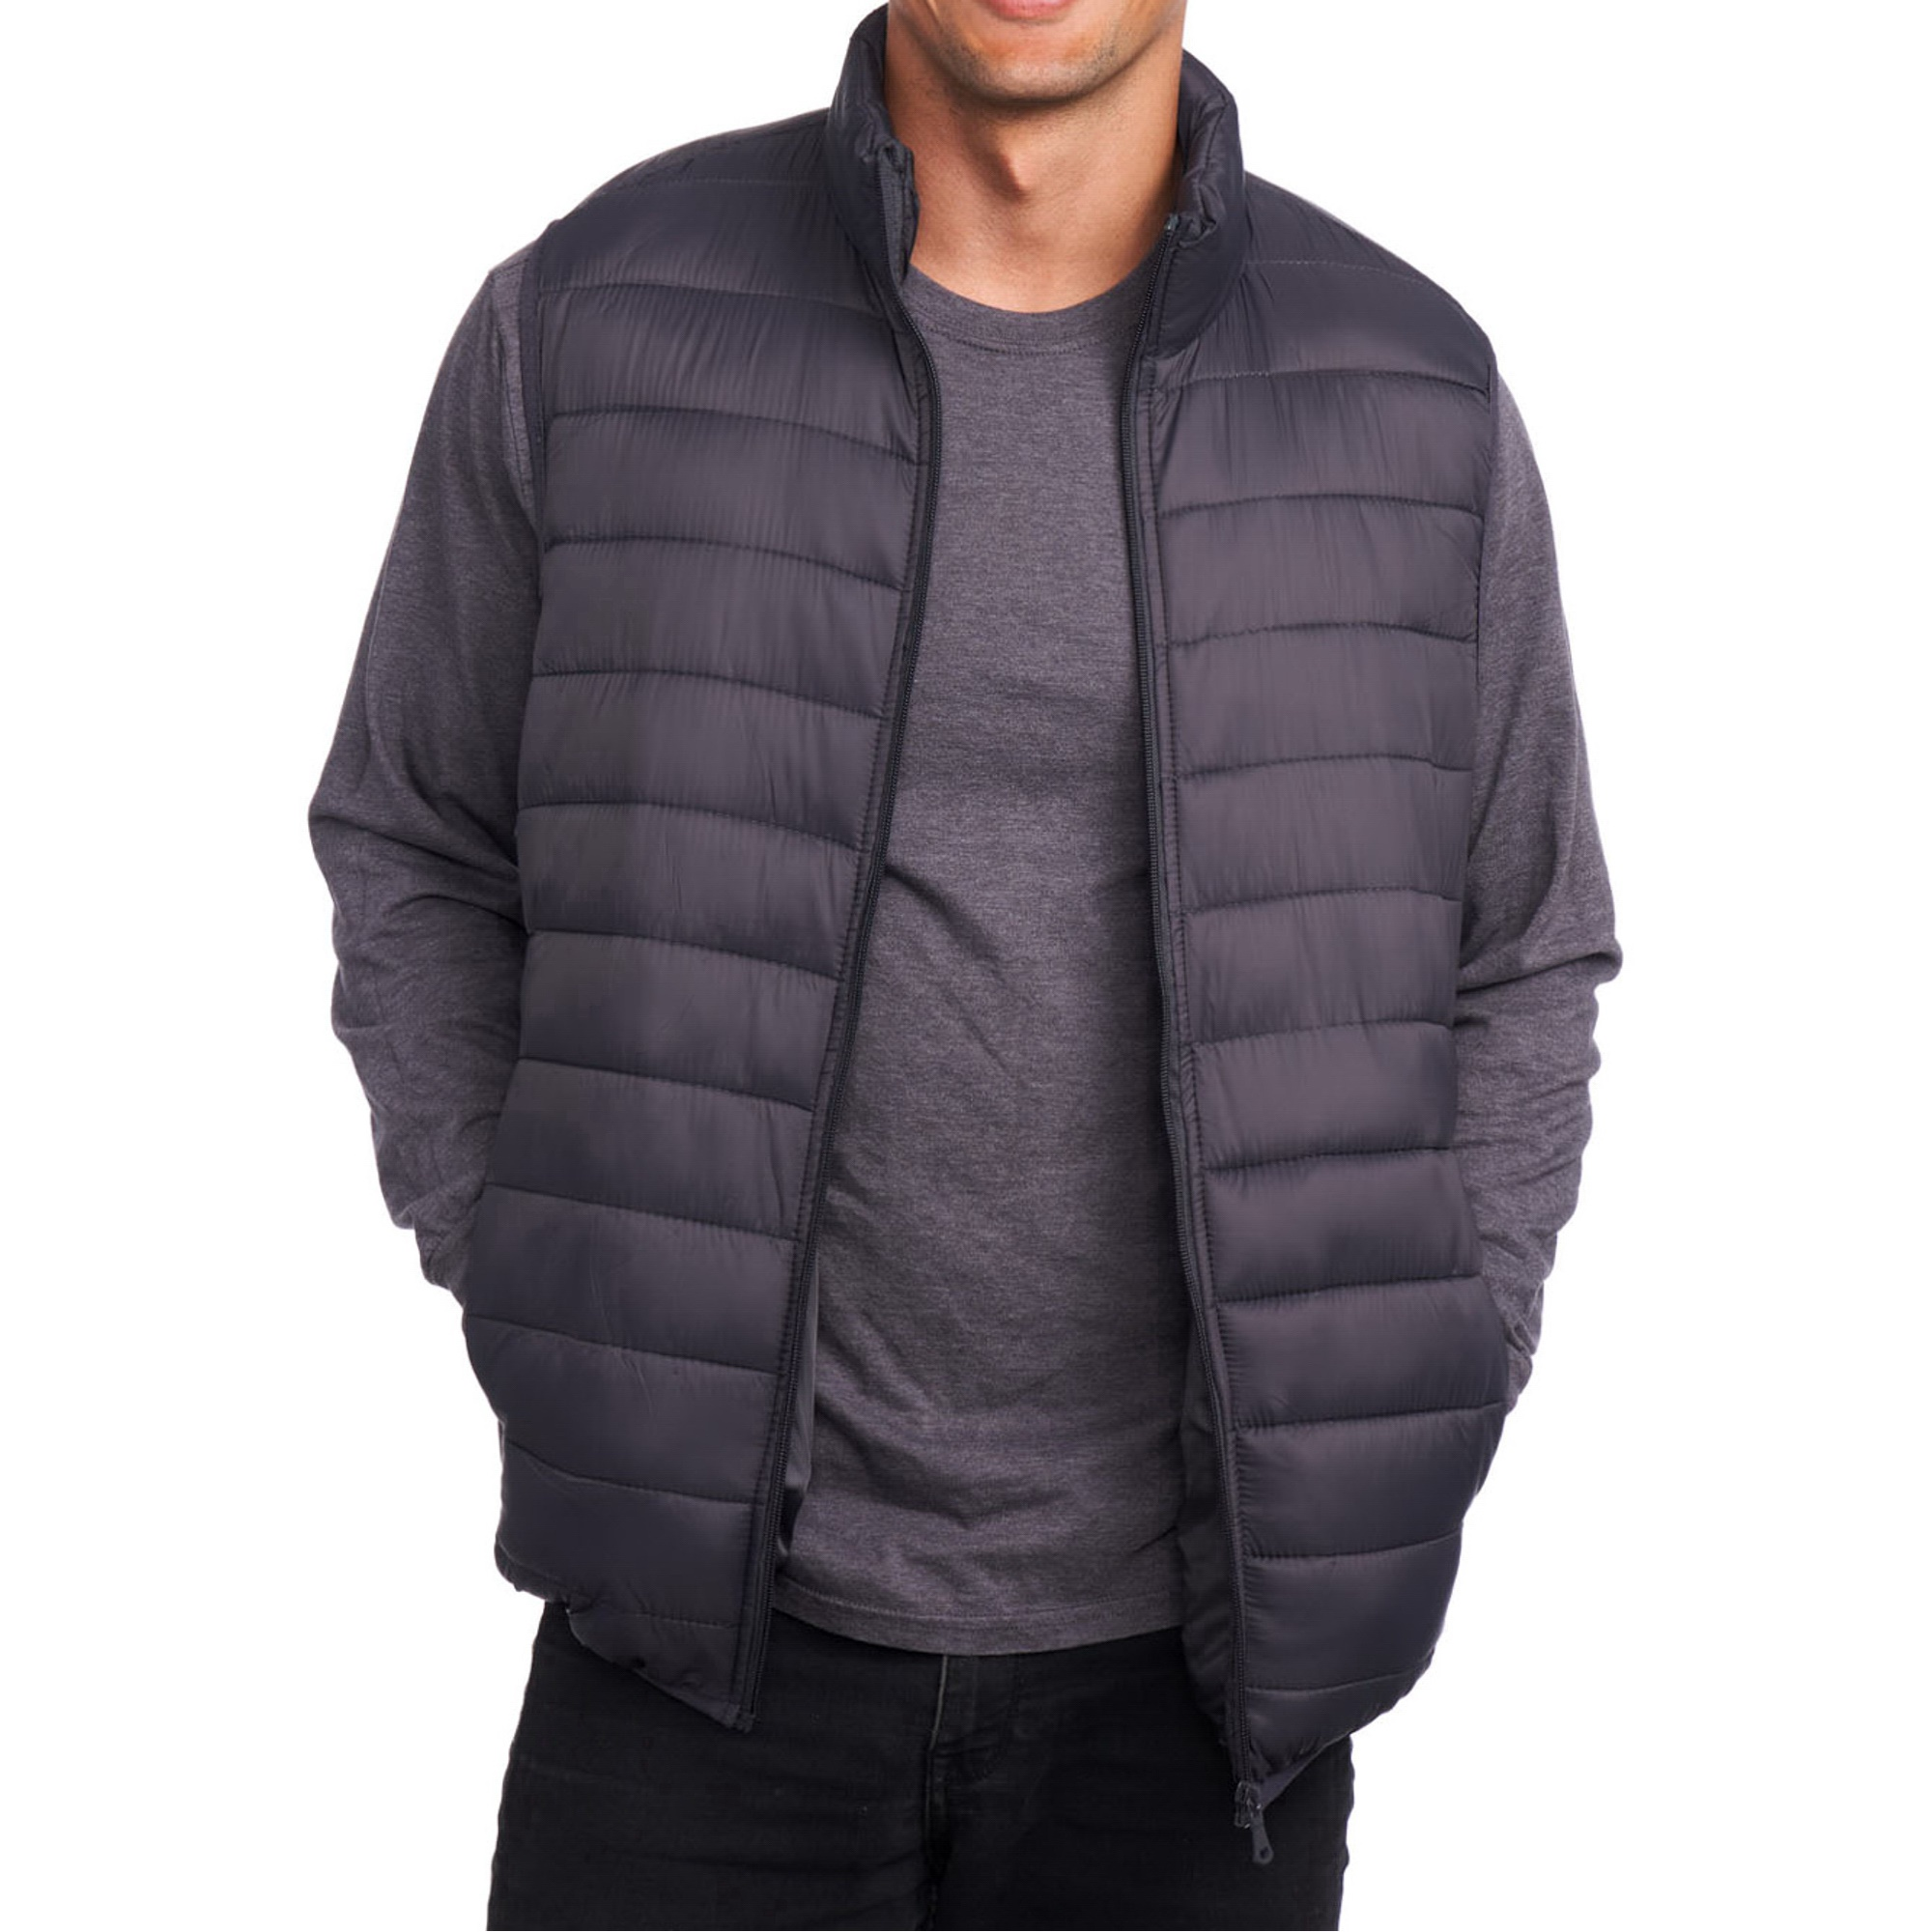 Alpine-Swiss-Mens-Down-Alternative-Vest-Jacket-Lightweight-Packable-Puffer-Vest